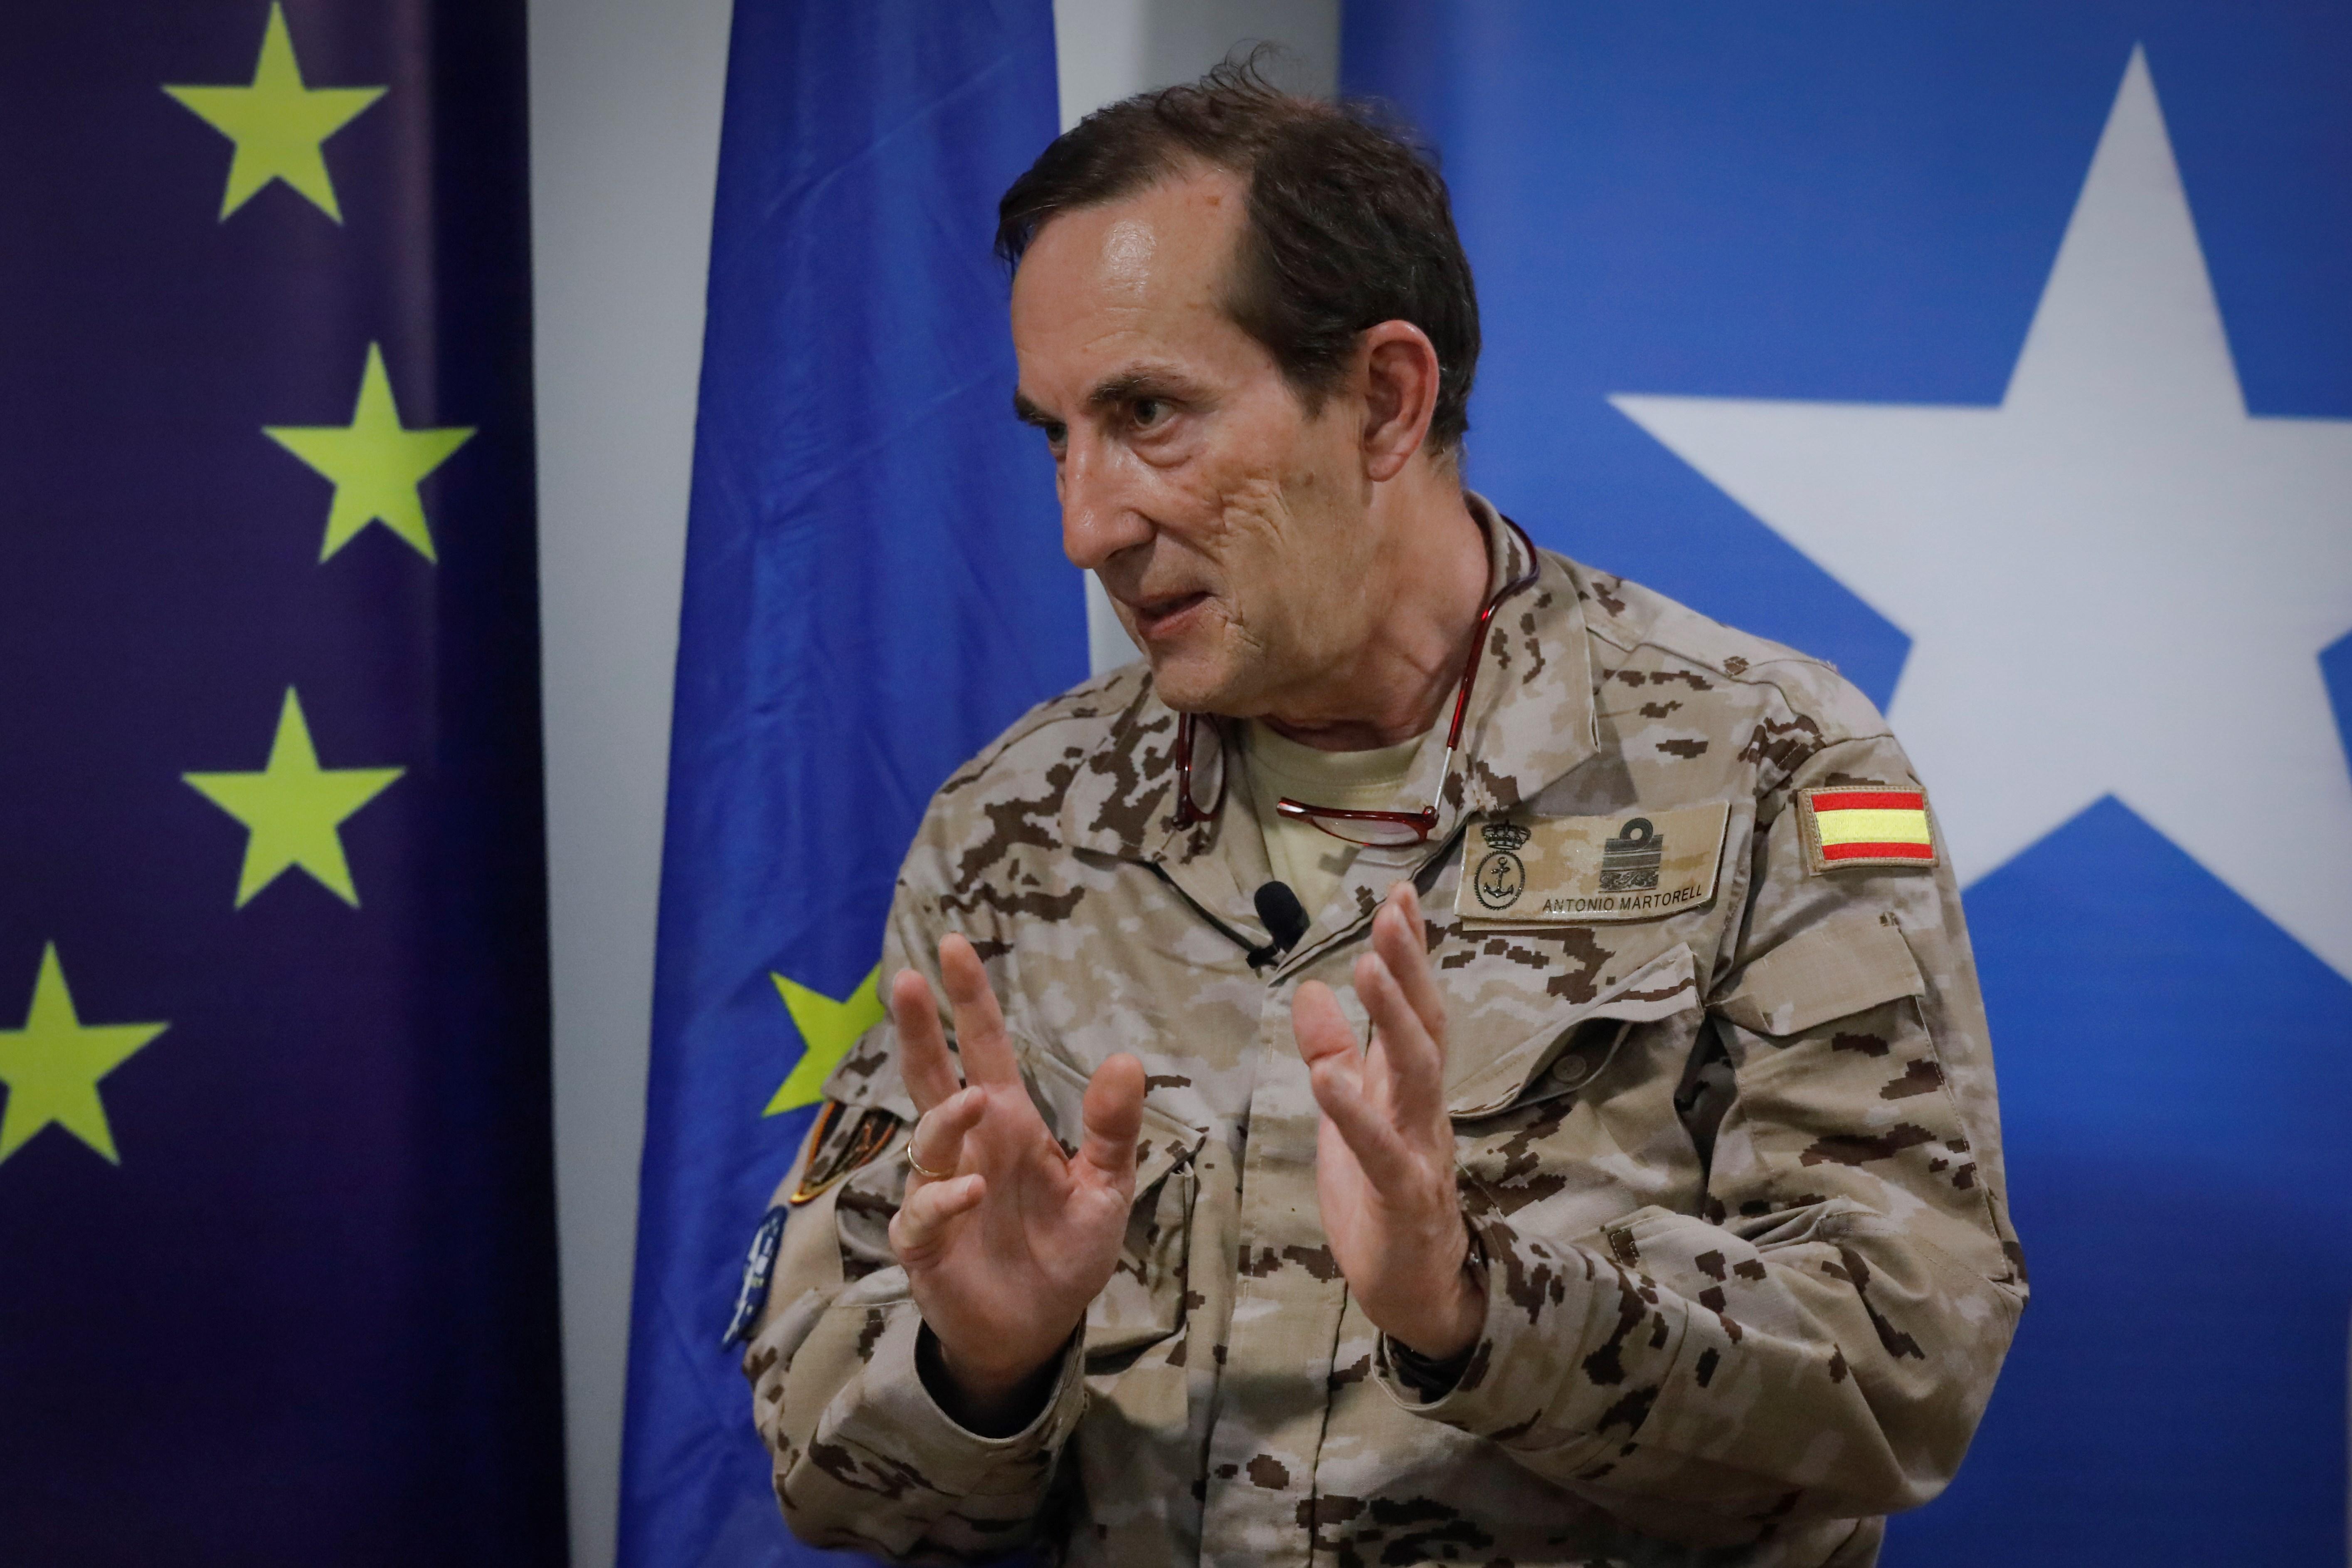 ice Admiral Antonio Martorell Lacave, Commander of the EU NAVFOR Somalia, Operation Atalanta